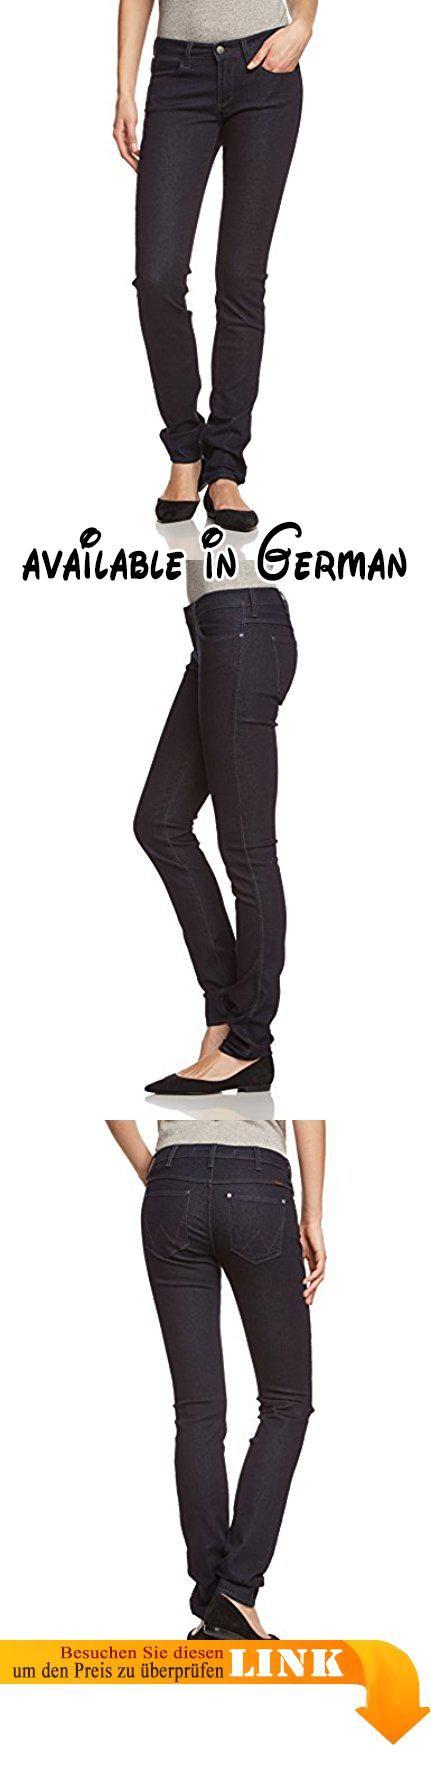 Wrangler Damen Skinny Jeans CORYNN, Gr. W27/L30, Blau (DARK BLUE 62B).  #Apparel #PANTS